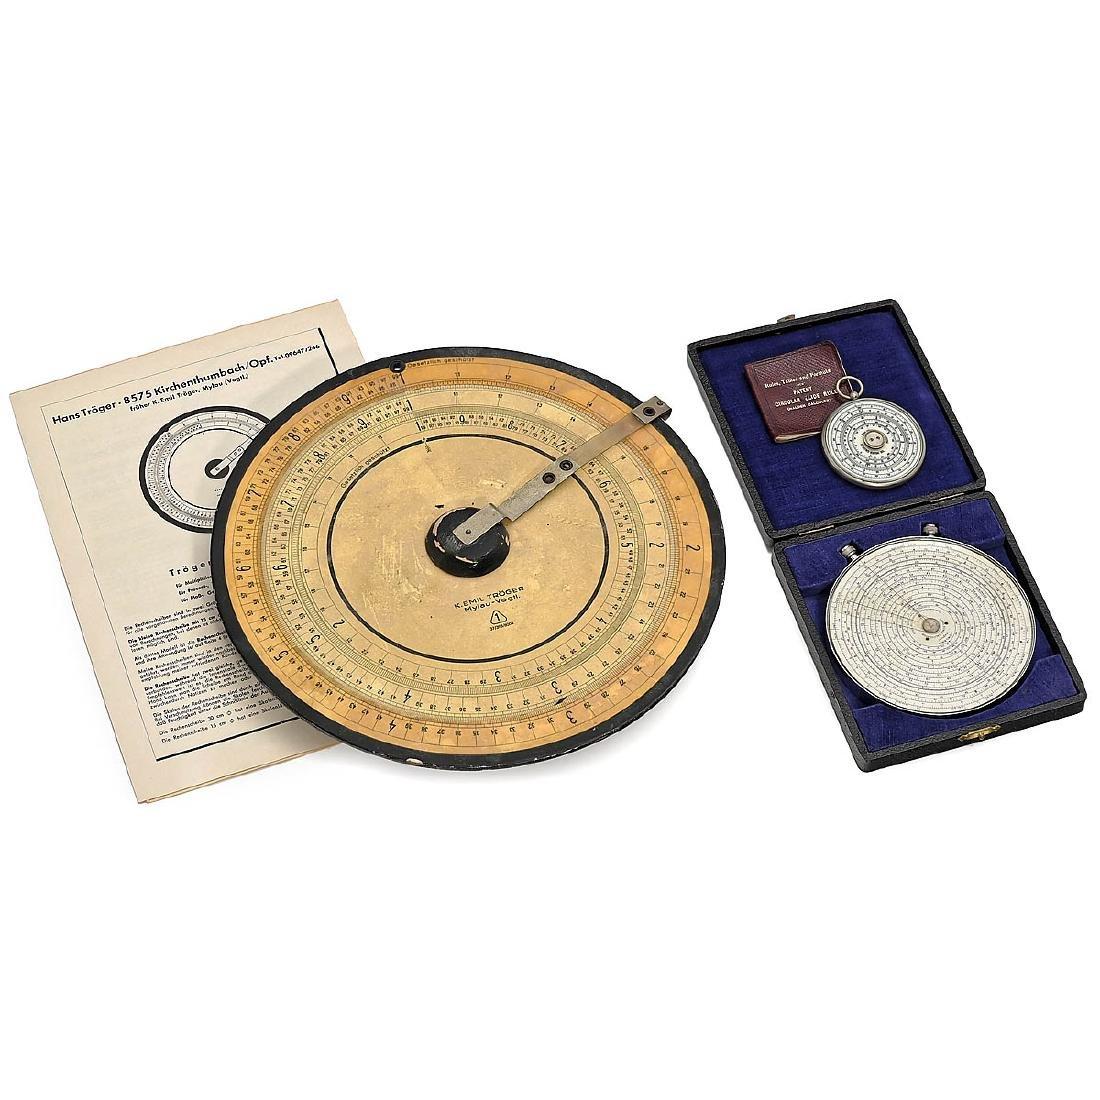 3 Logarithmic Calculating Discs